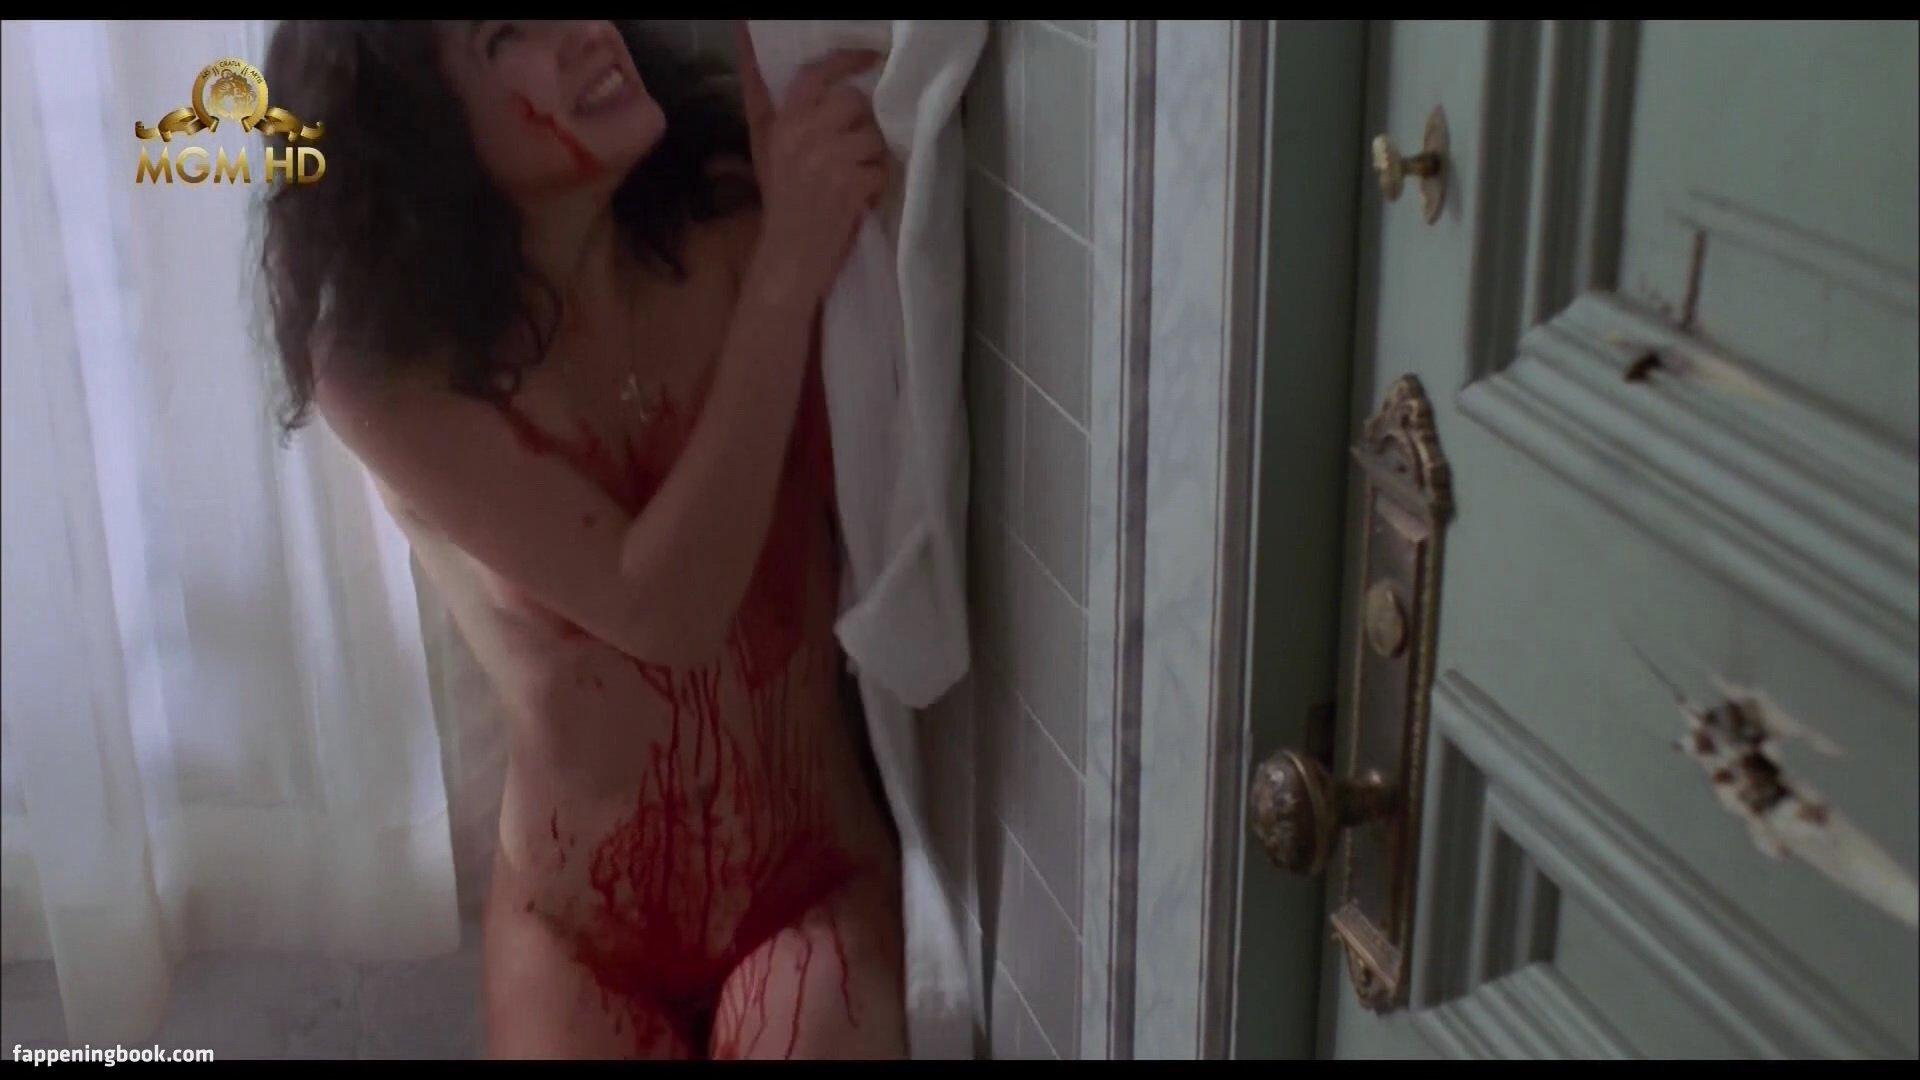 Daphne Zuniga Nude Last Rites